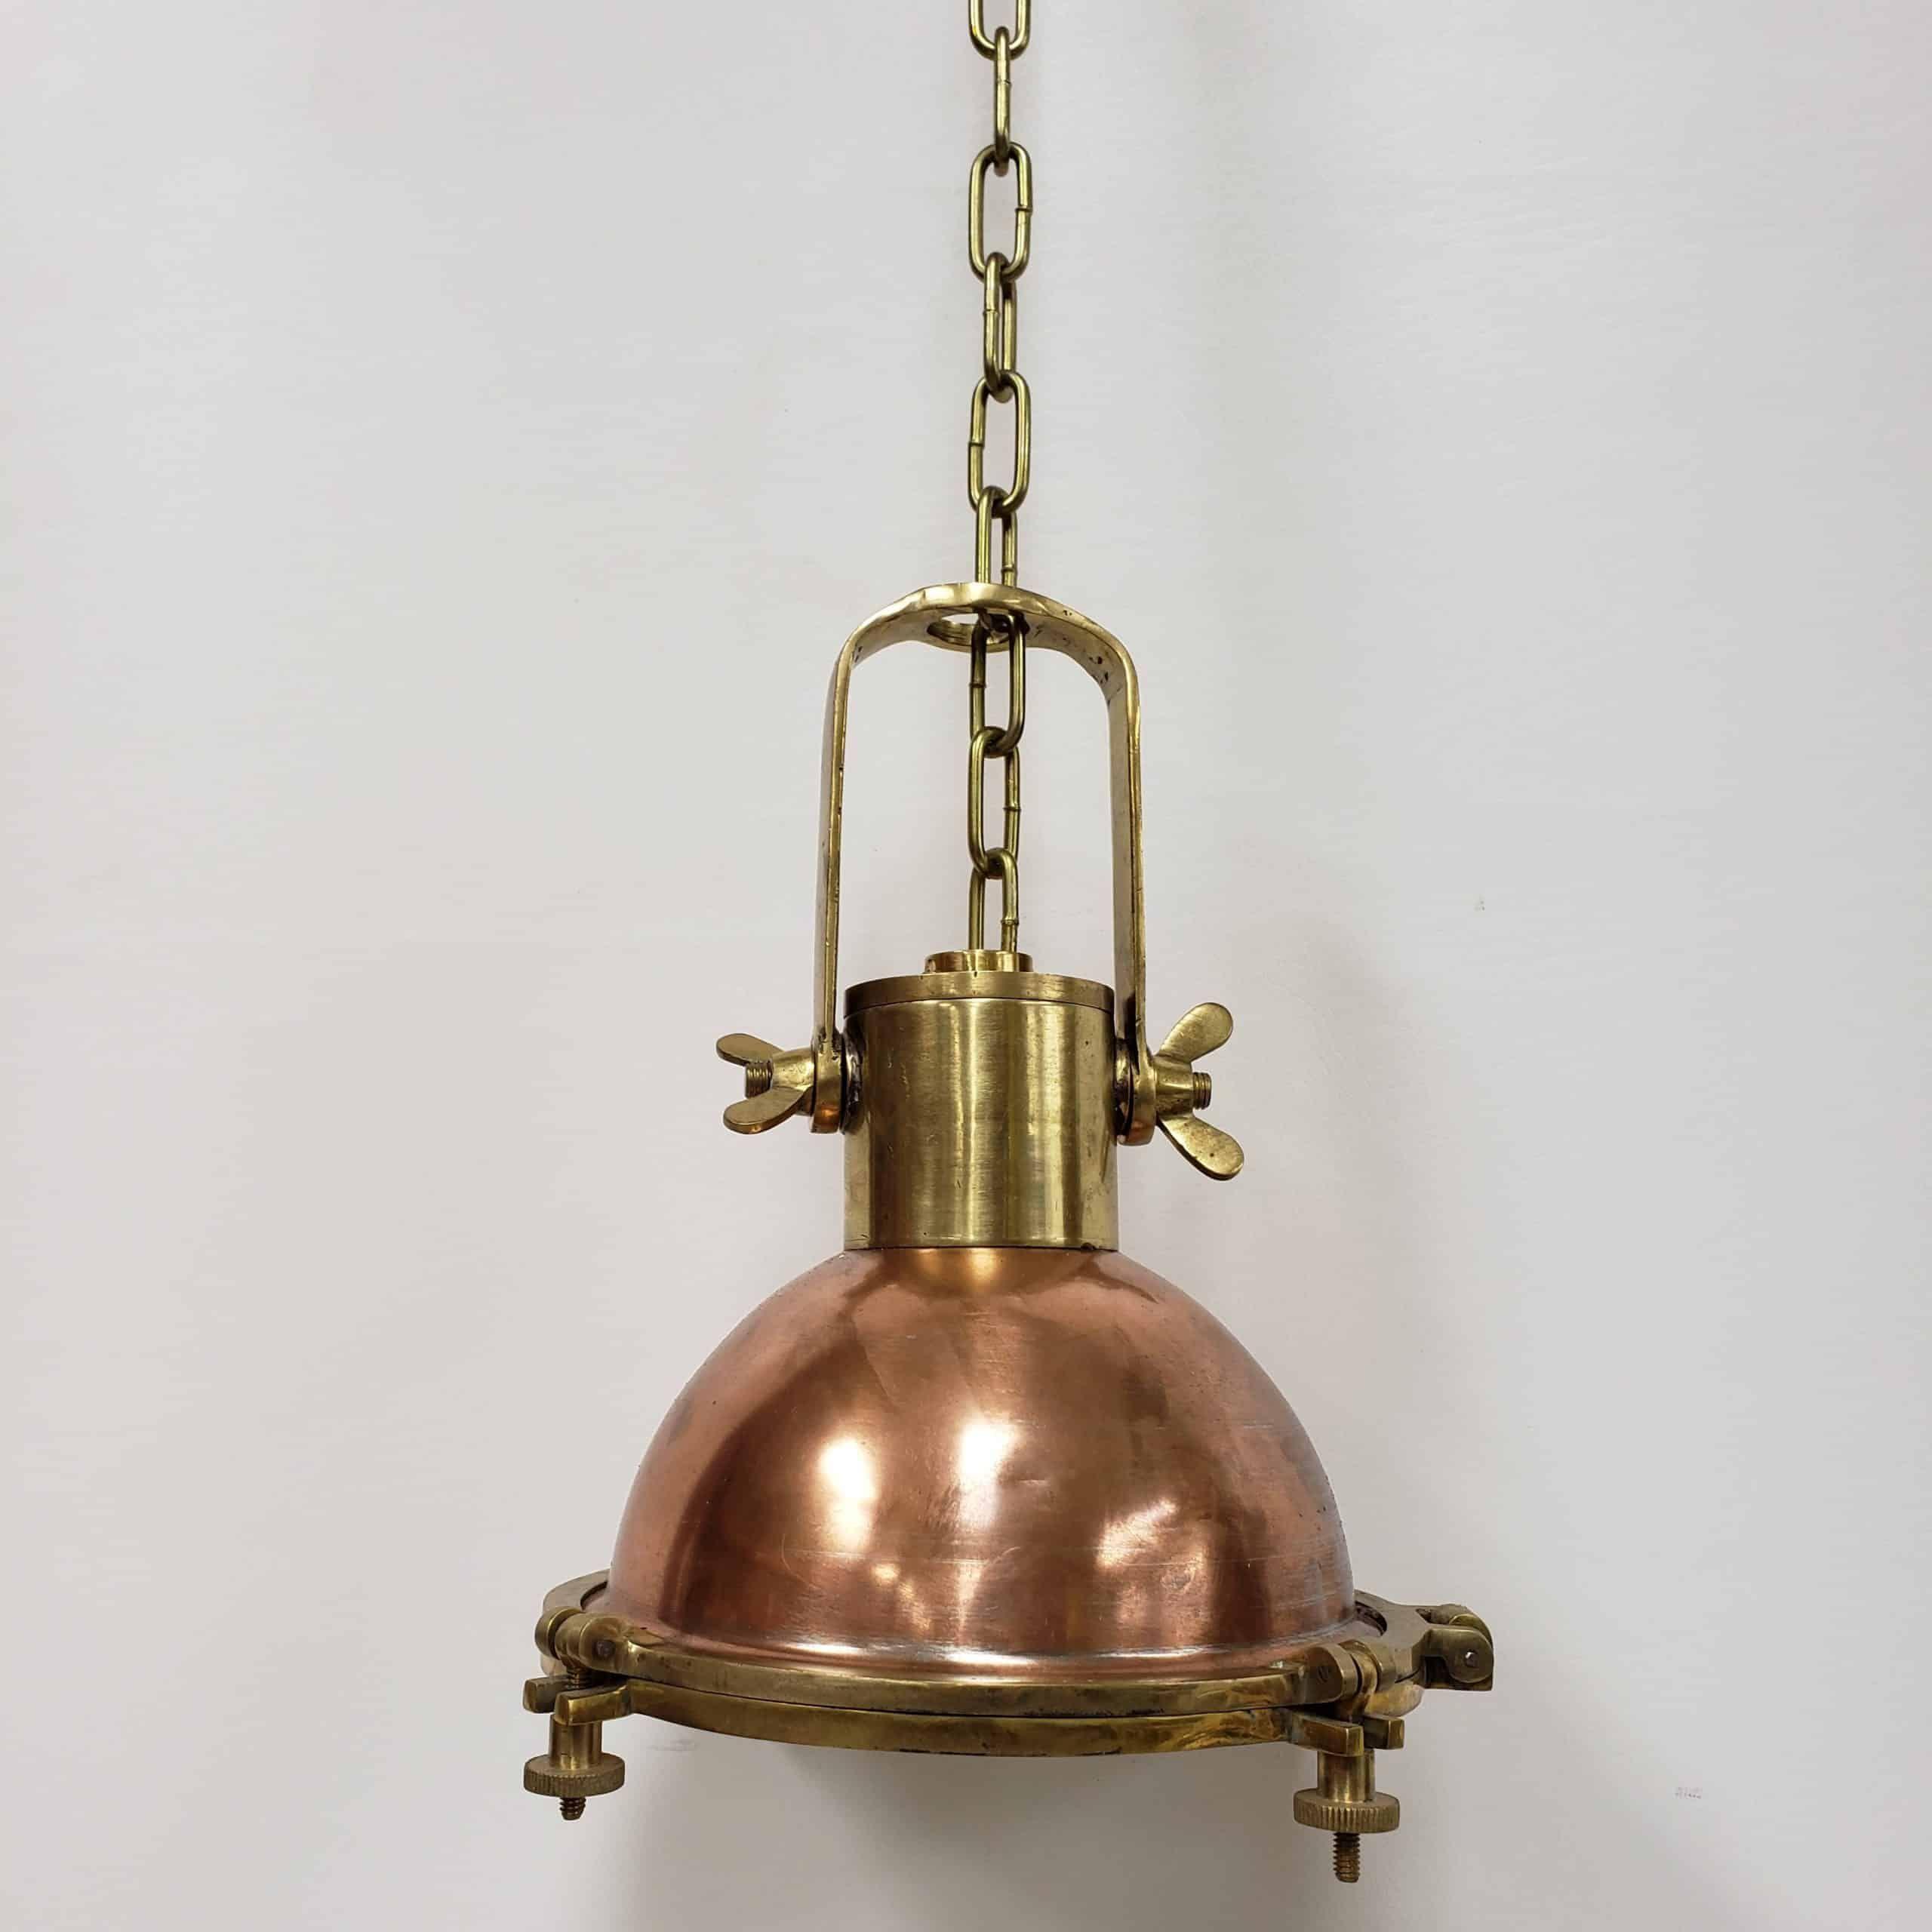 Vintage Nautical Cargo Copper Pendant Light With Chain In 2020 Copper Pendant Lights Nautical Pendant Lighting Pendant Light